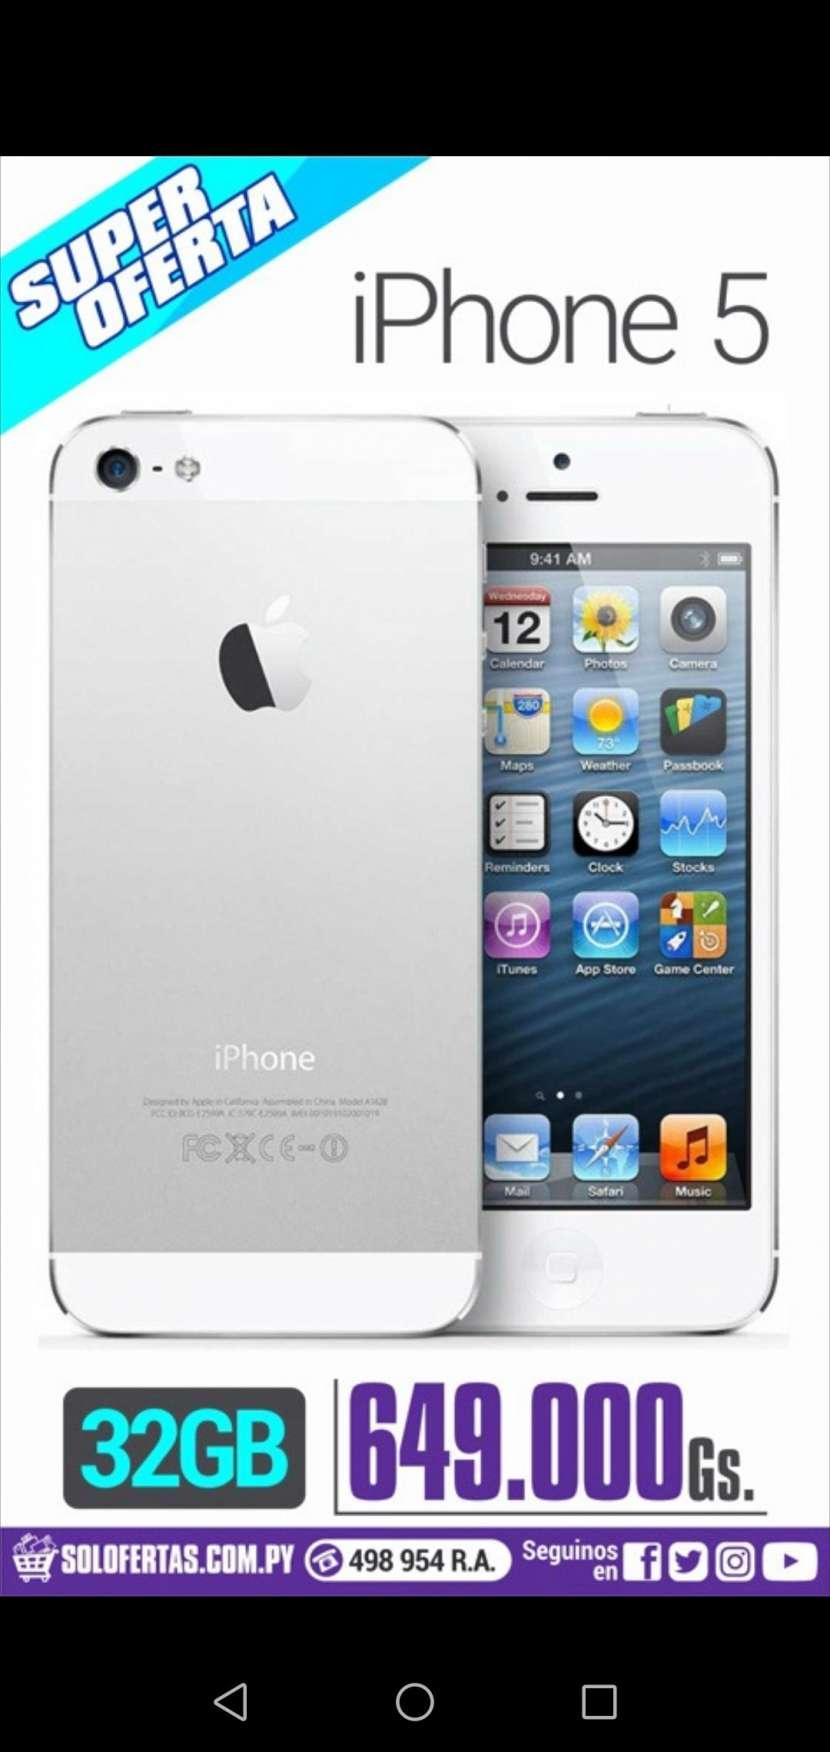 iPhone 5 de 32 gb - 0